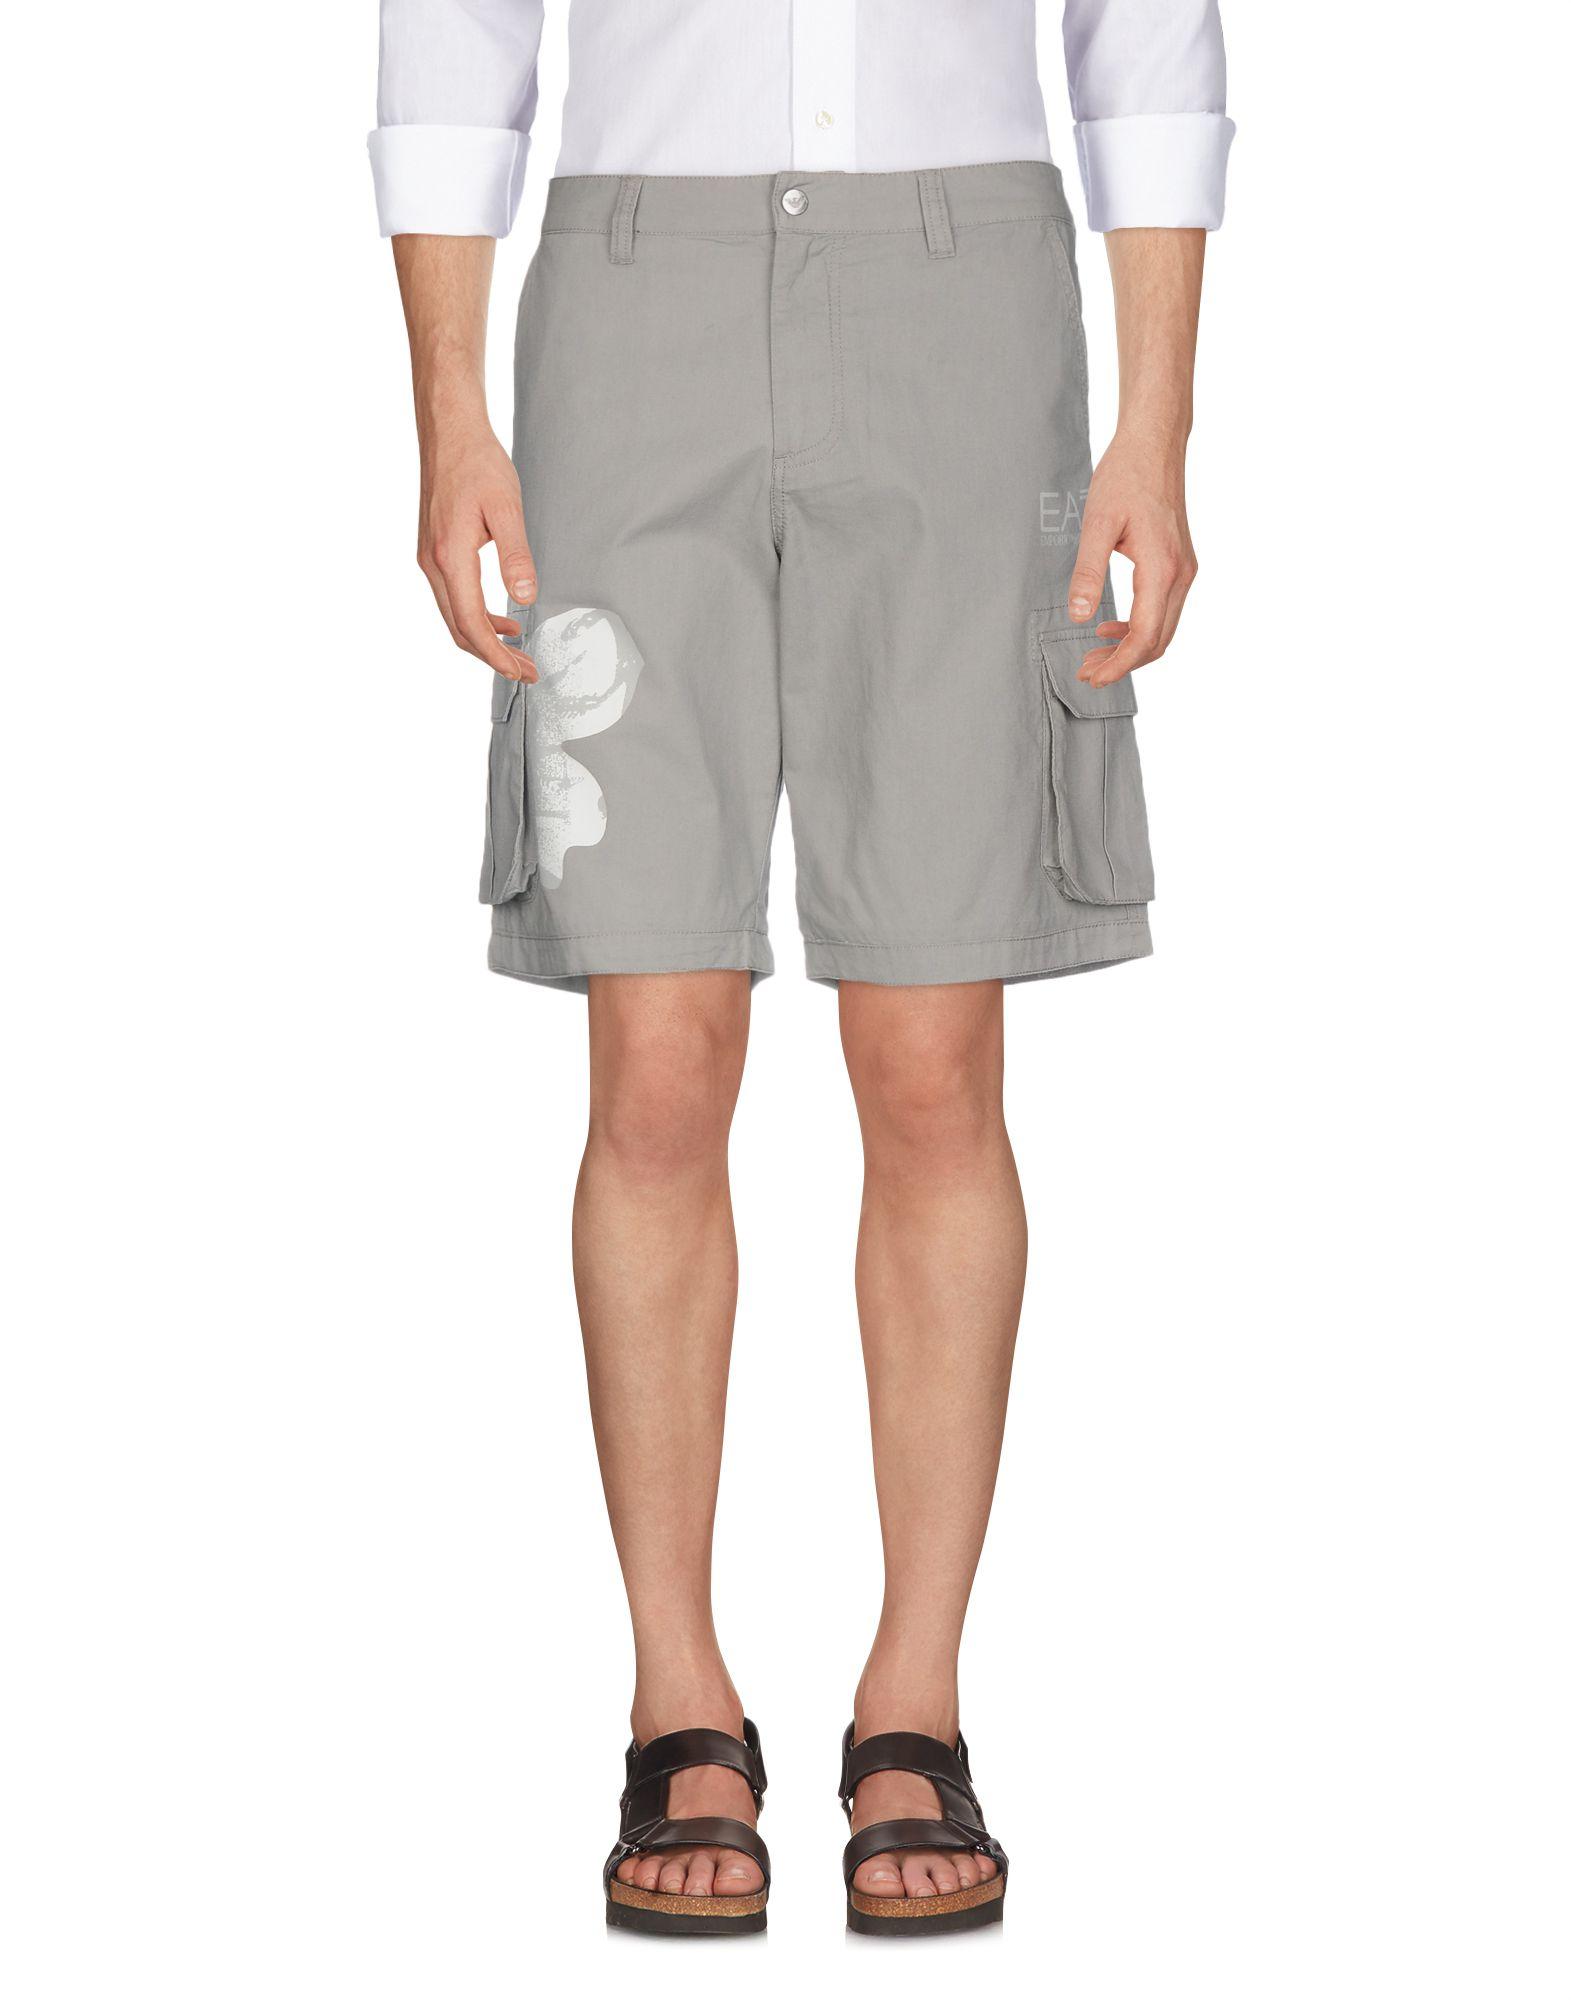 Shorts Shorts Shorts & Bermuda Ea7 Uomo - 13157950HT ca1d1f